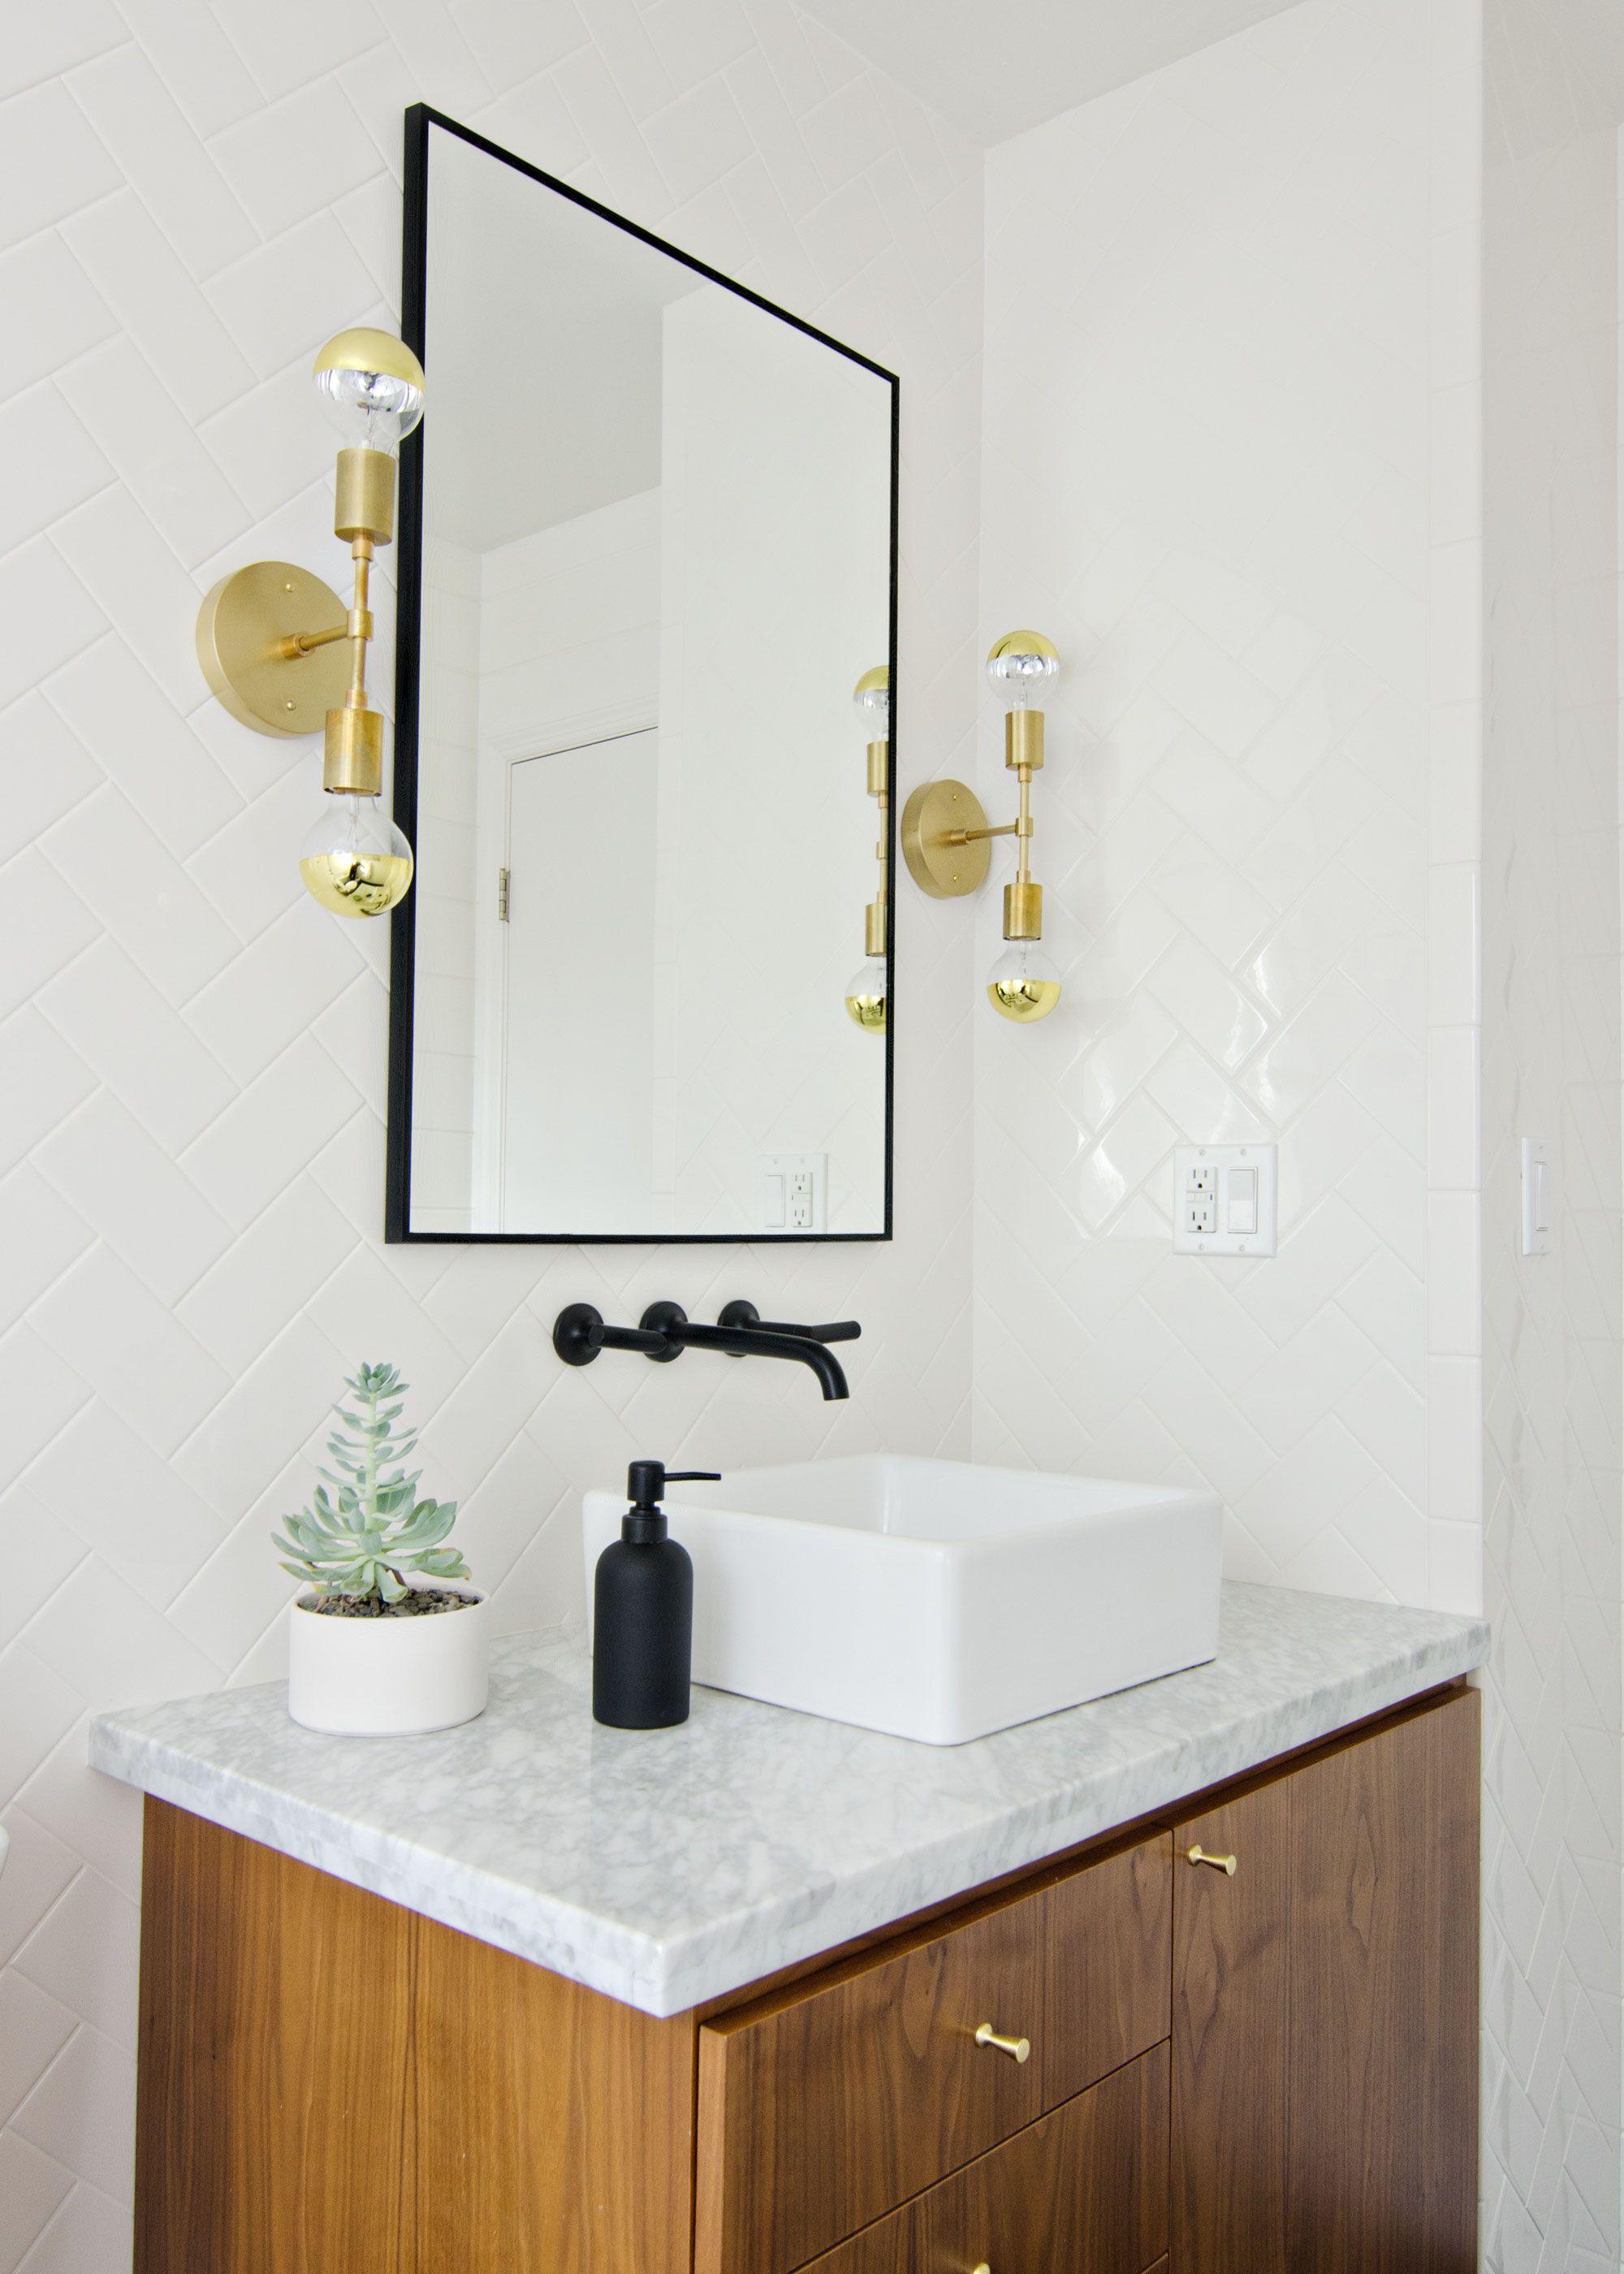 Dilemma With My Bathroom Lights Bathroom Lighting Bathroom